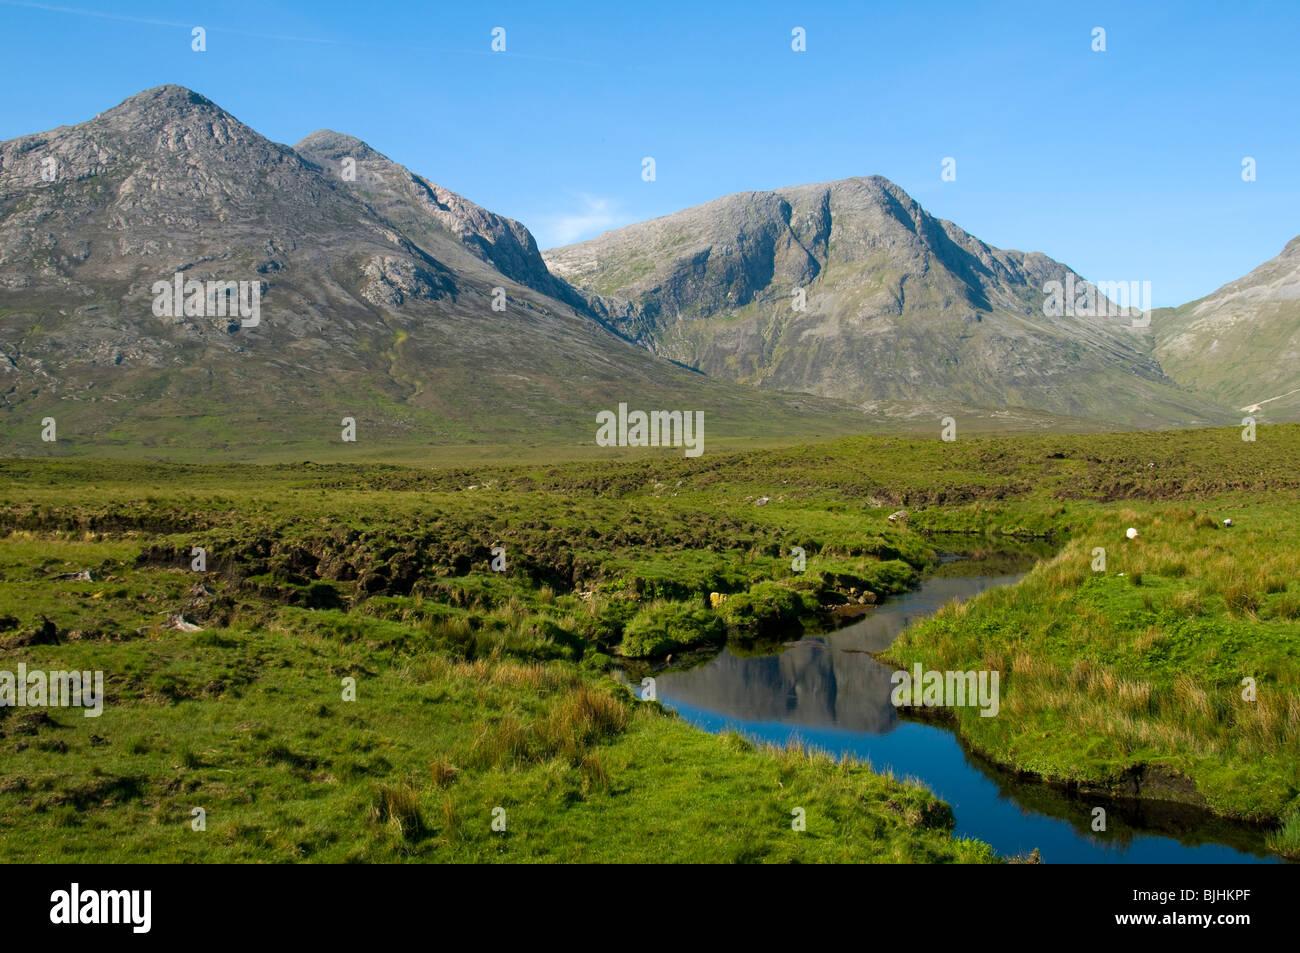 The Twelve Bens of Connemara range from Glen Inagh, Connemara, County Galway, Ireland - Stock Image